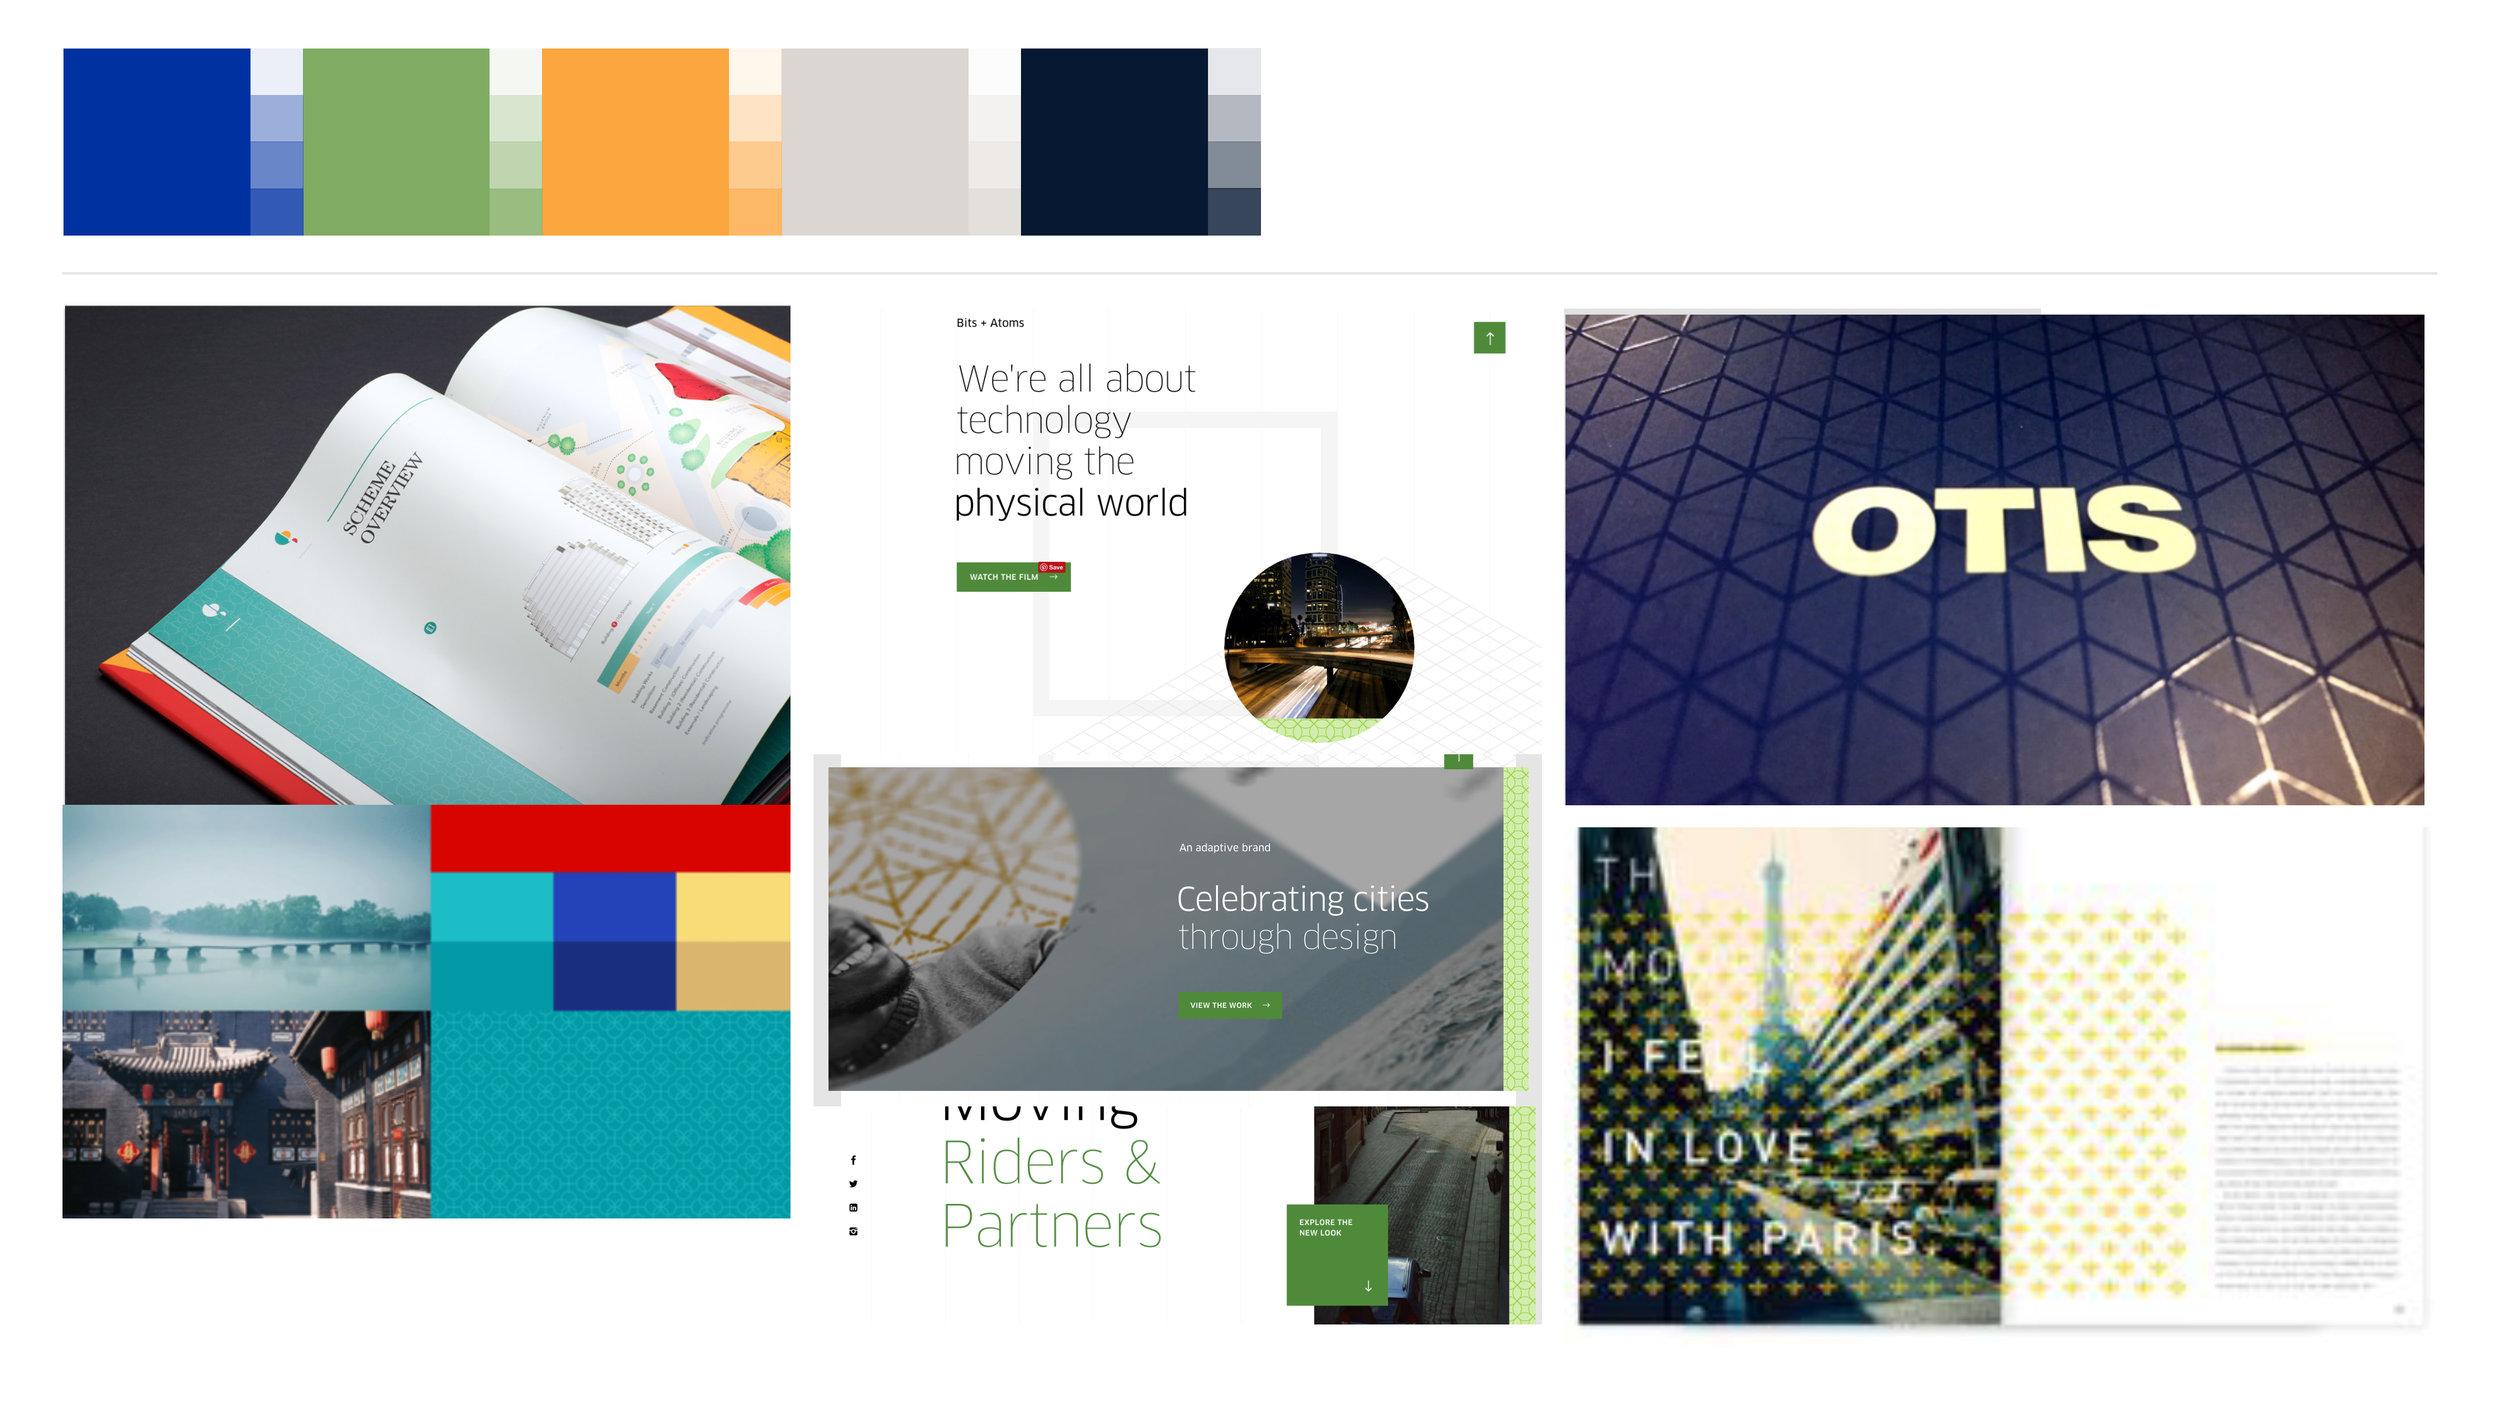 Otis_BrandConcepts_TISSUE_SESSION_102016_Page_27.jpg